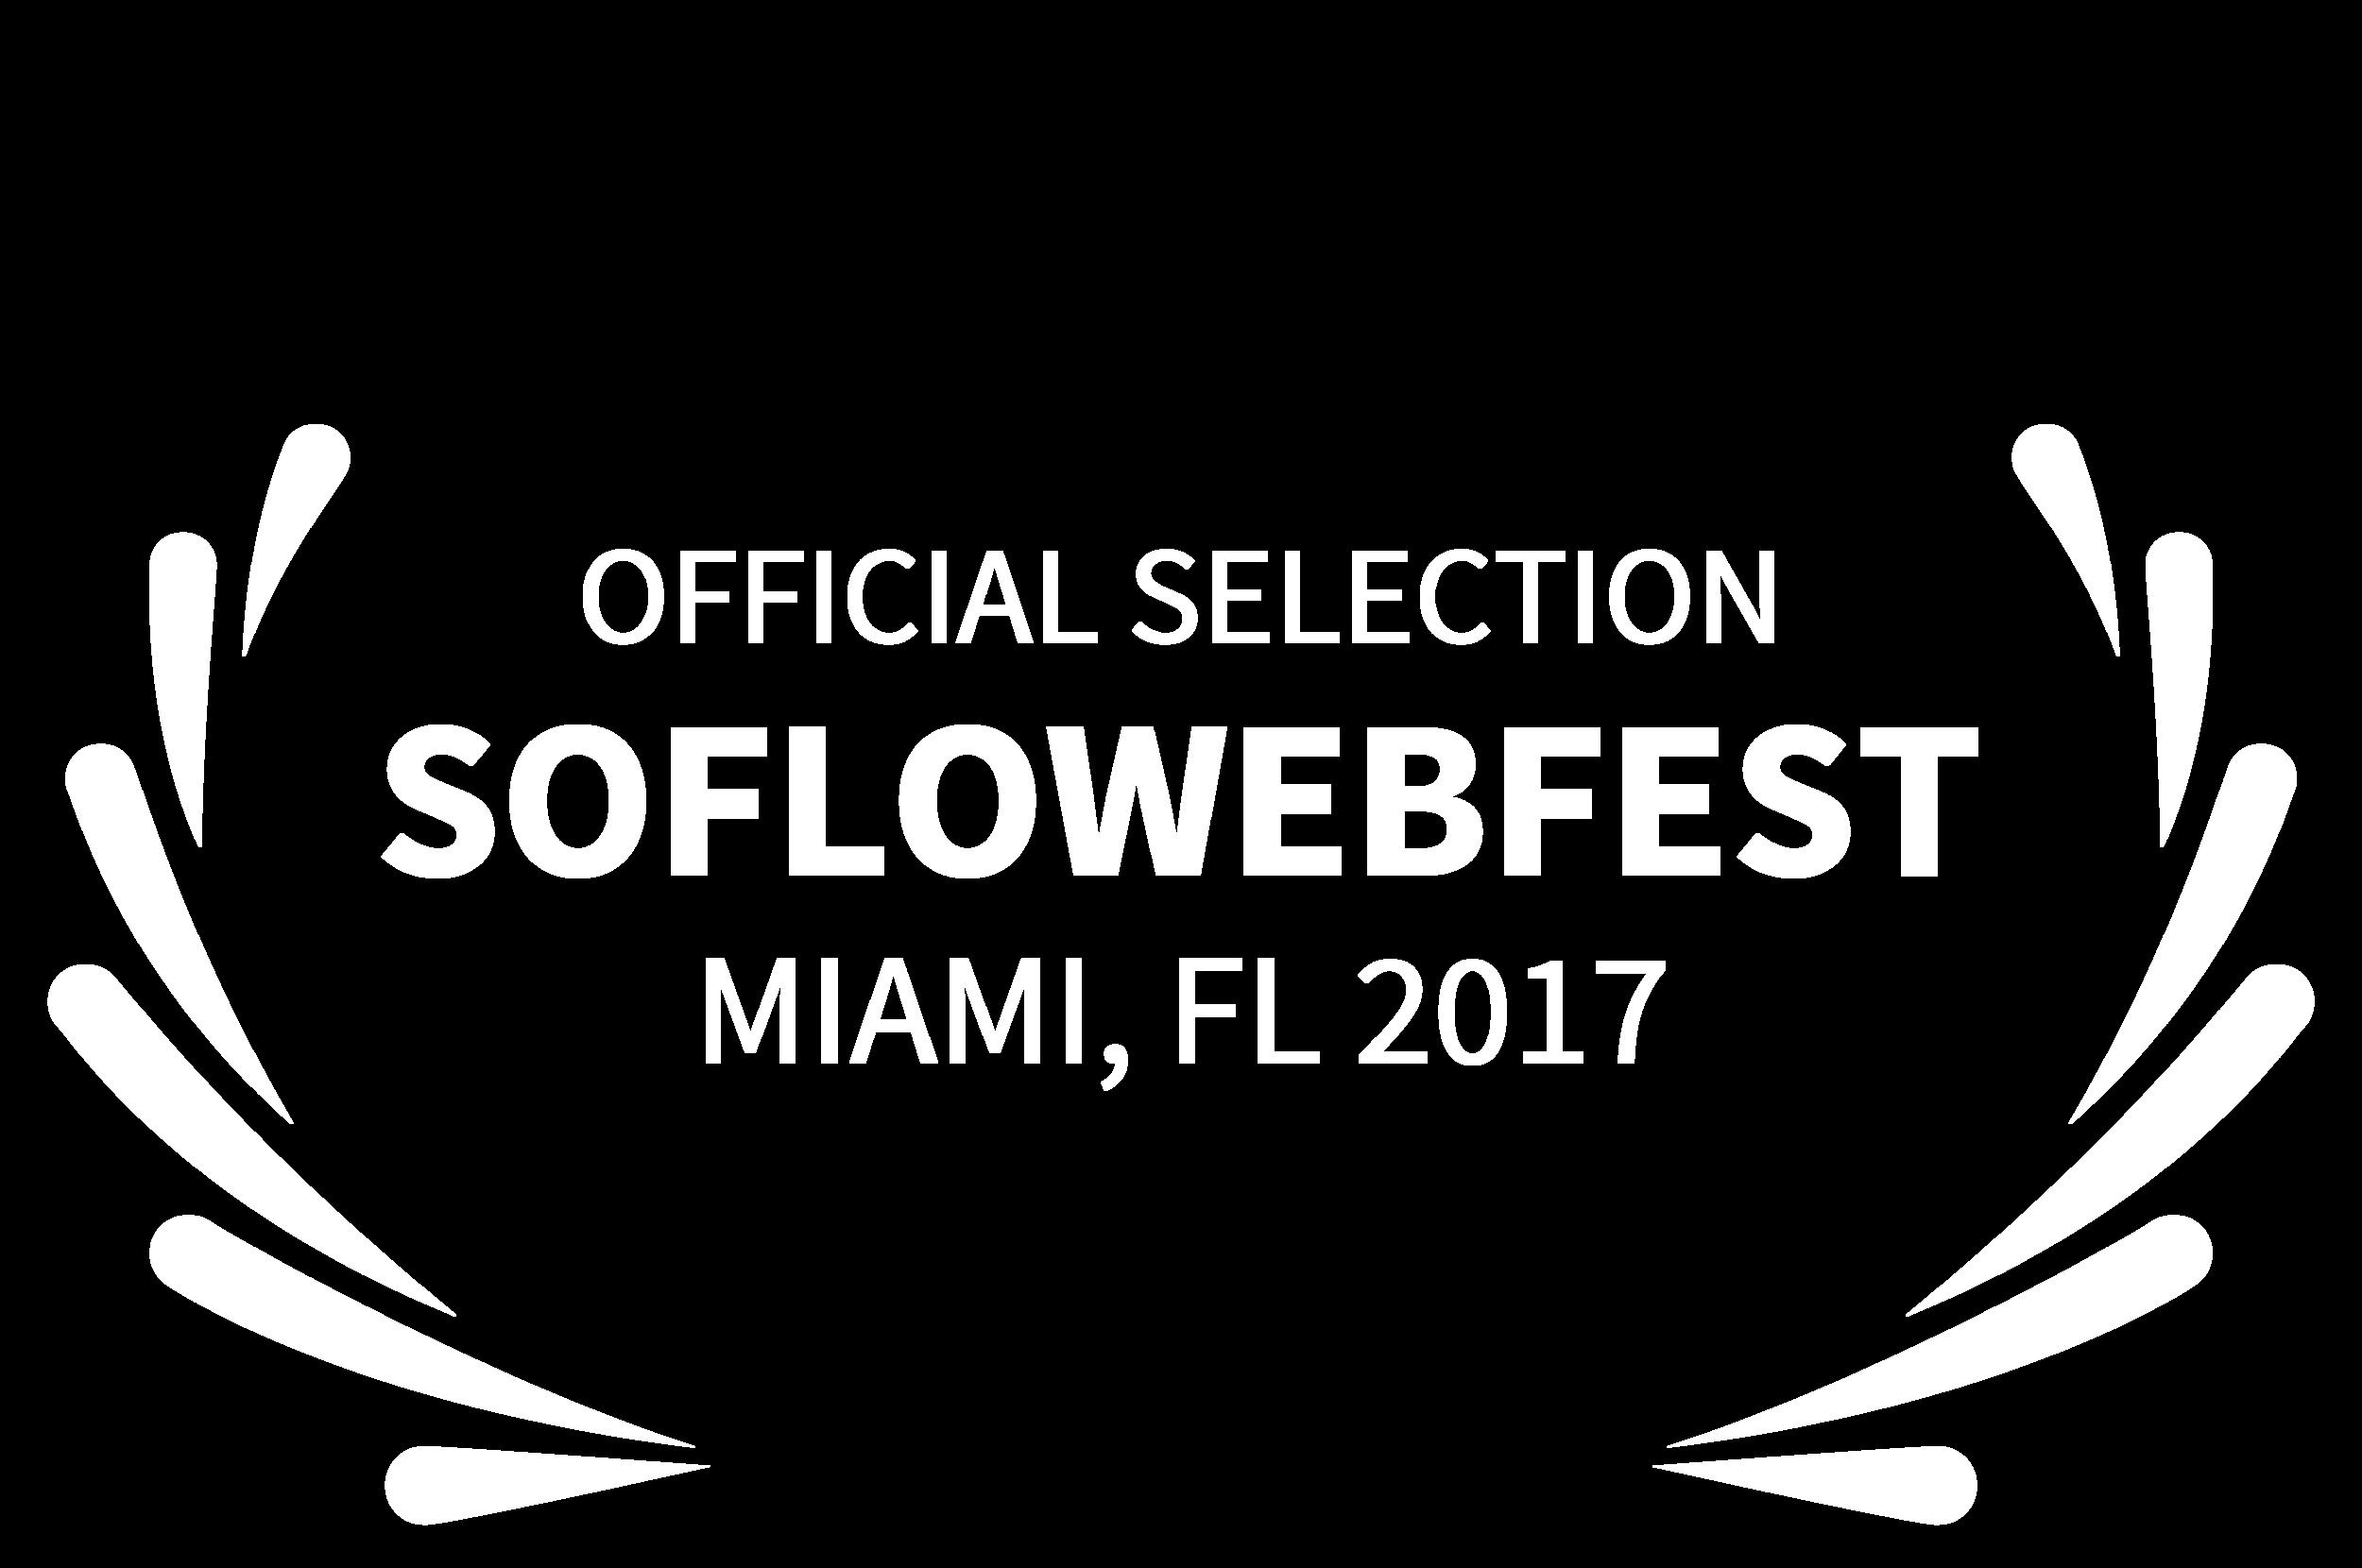 OFFICIALSELECTION-SOFLOWEBFEST-MIAMIFL2017 (3).png